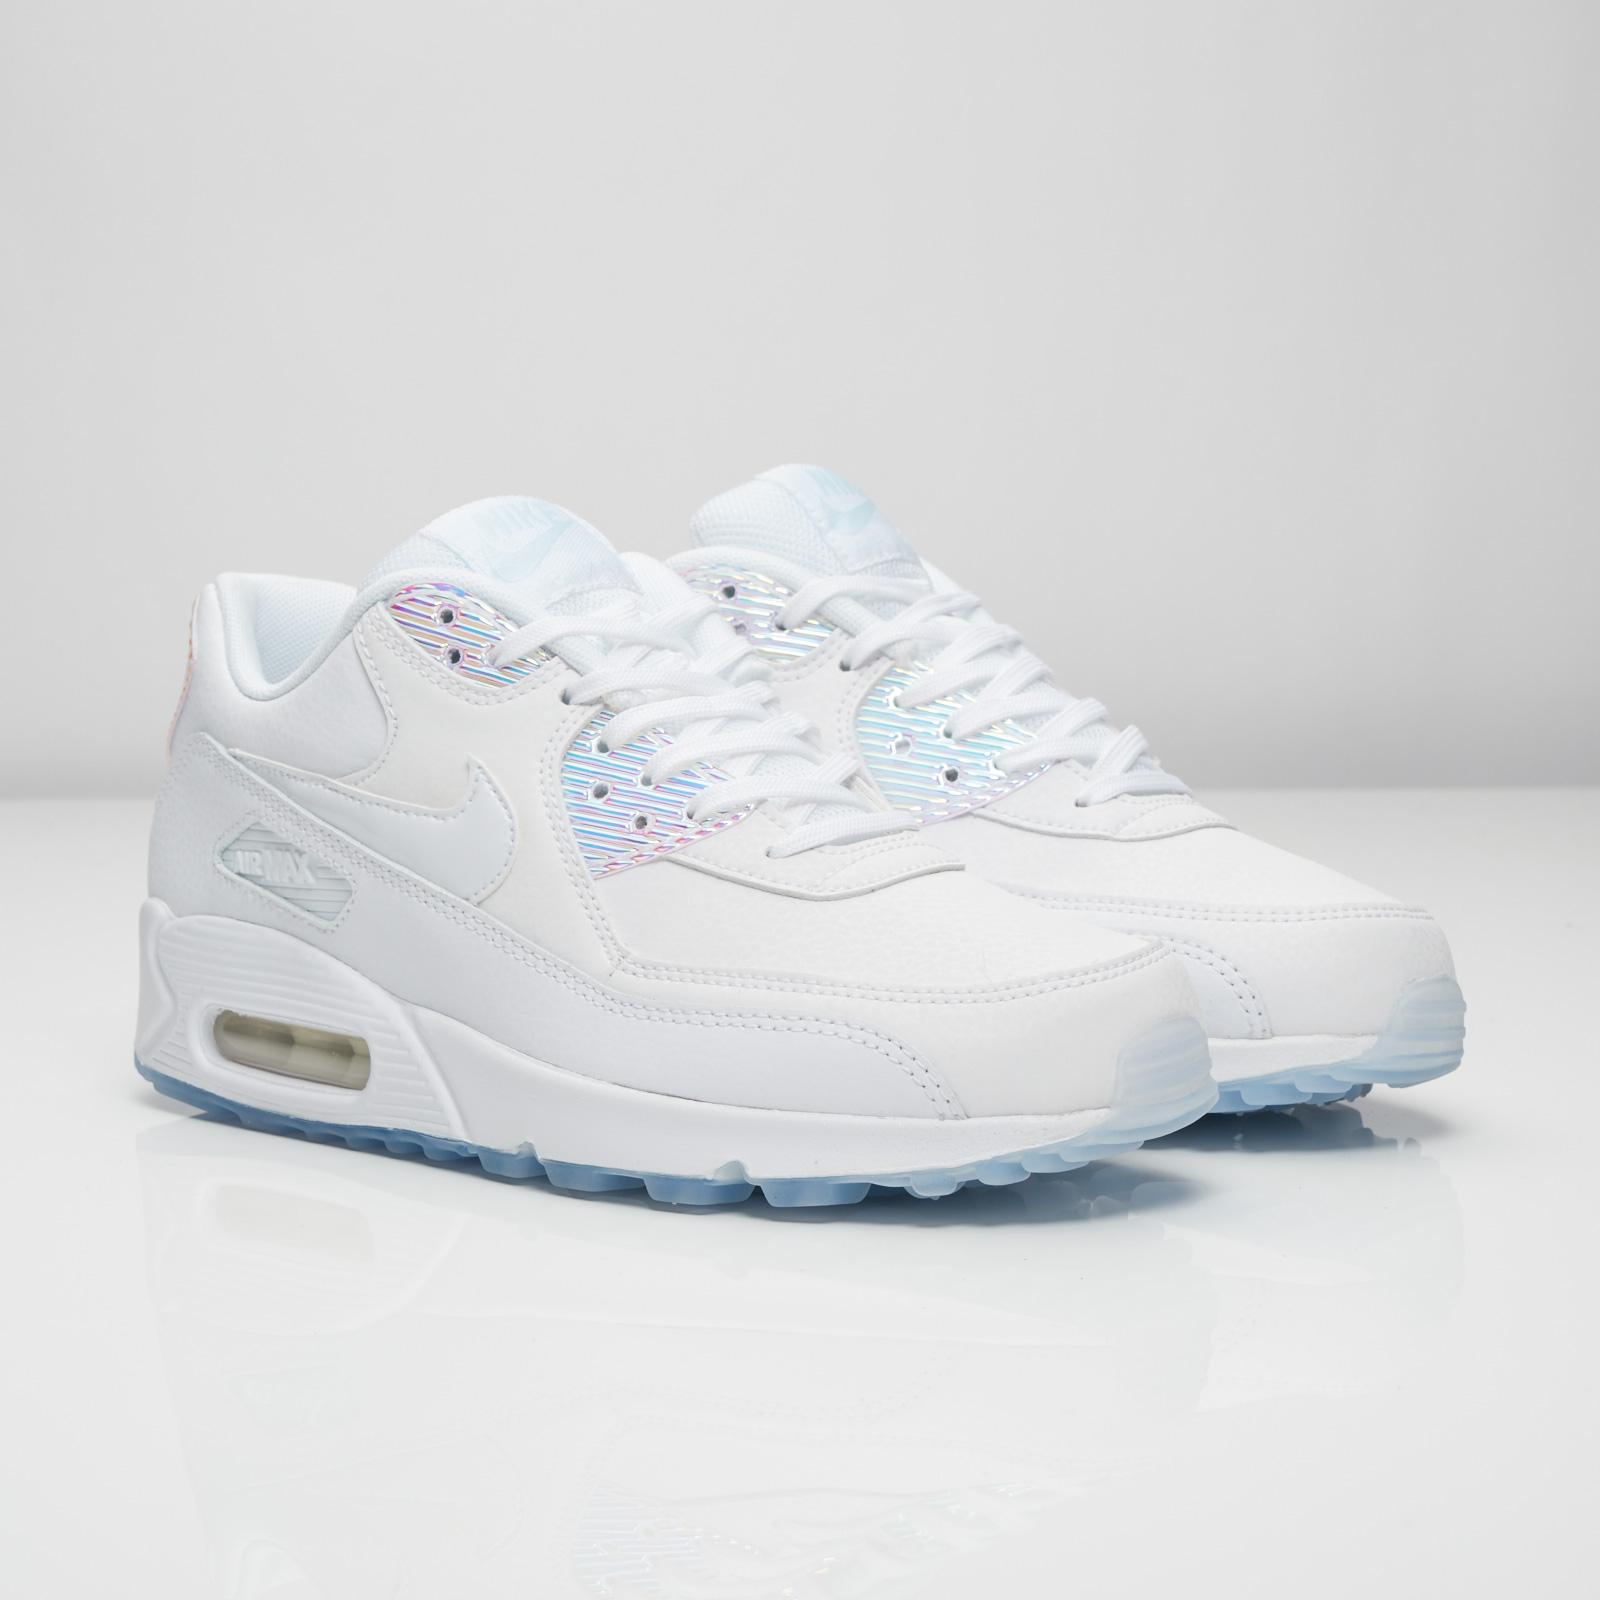 buy online 87bc5 6e395 Nike Wmns Air Max 90 Premium